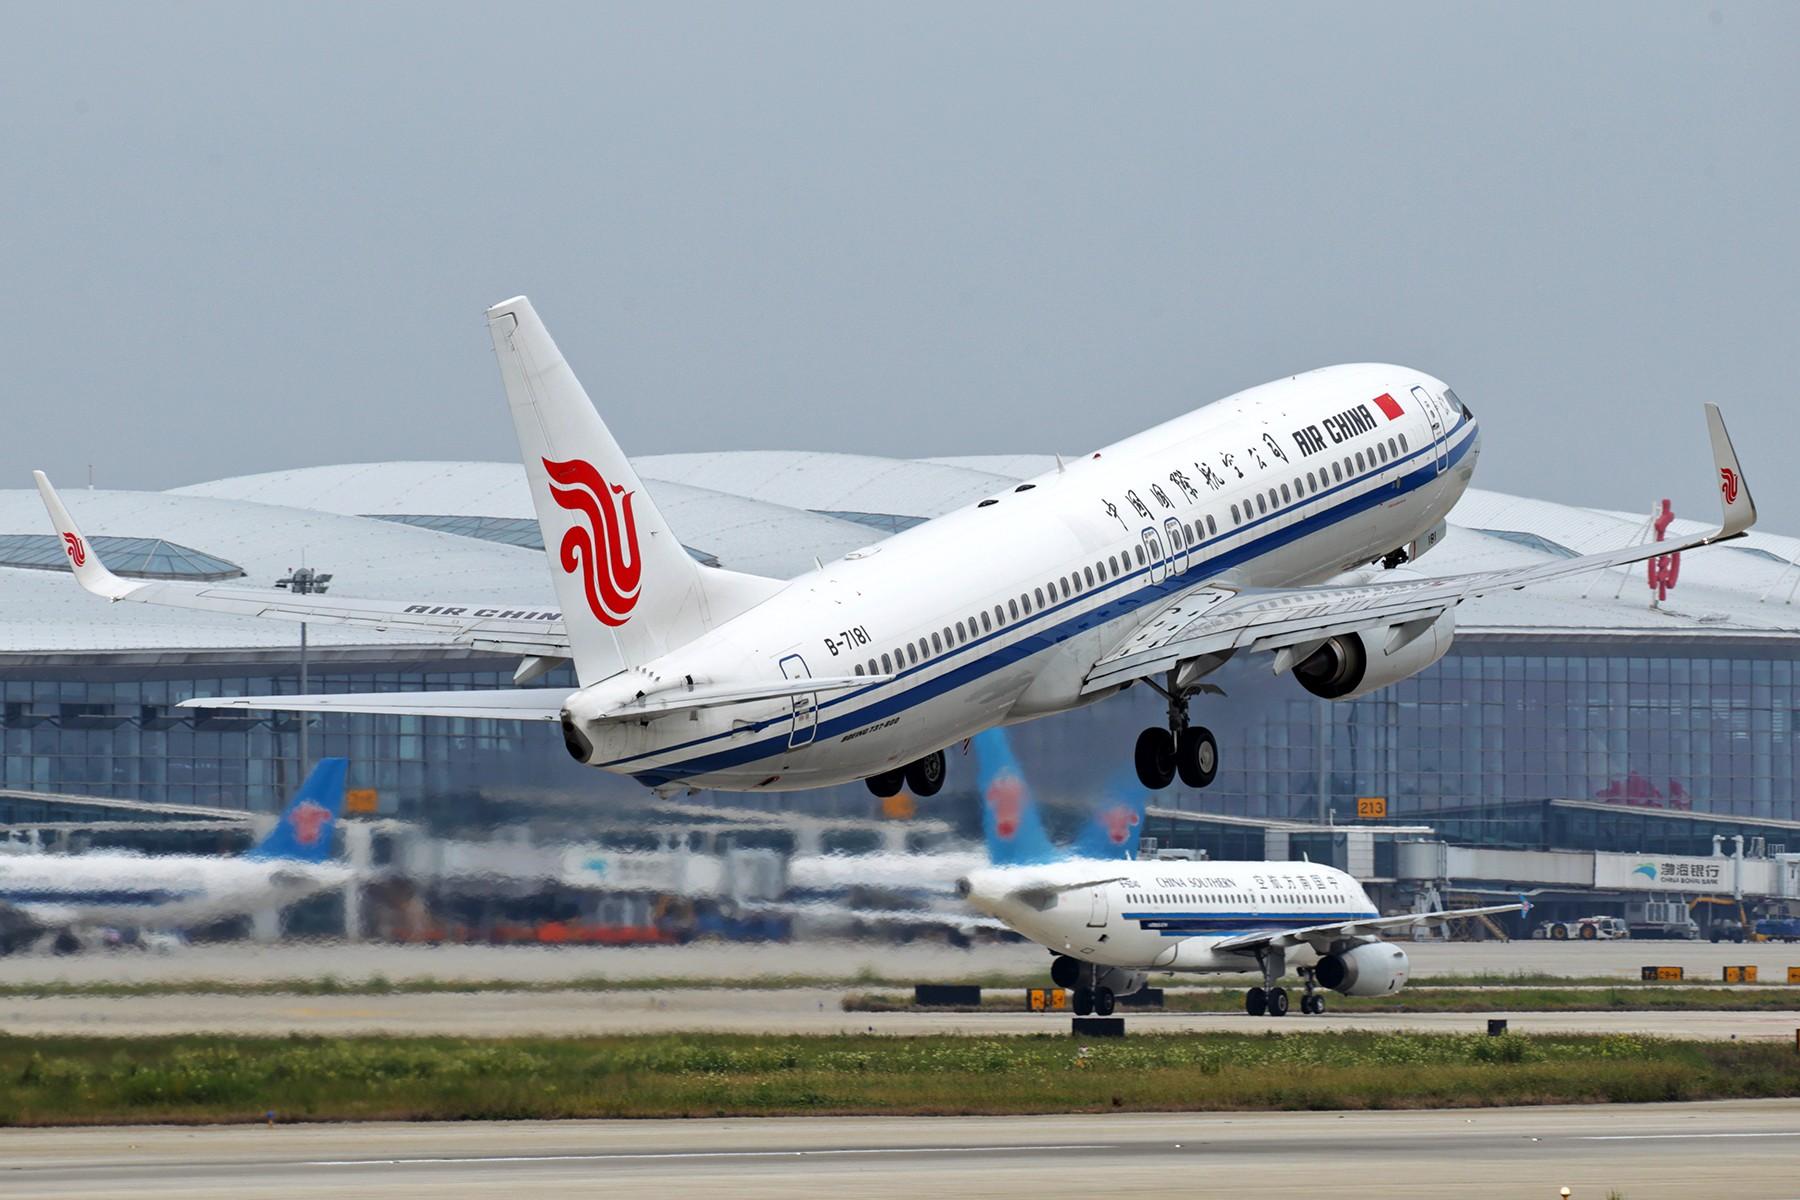 Re:[原创]【BLDDQ】******NKG07/25单跑道运行中****** BOEING 737-800 B-7181 中国南京禄口国际机场